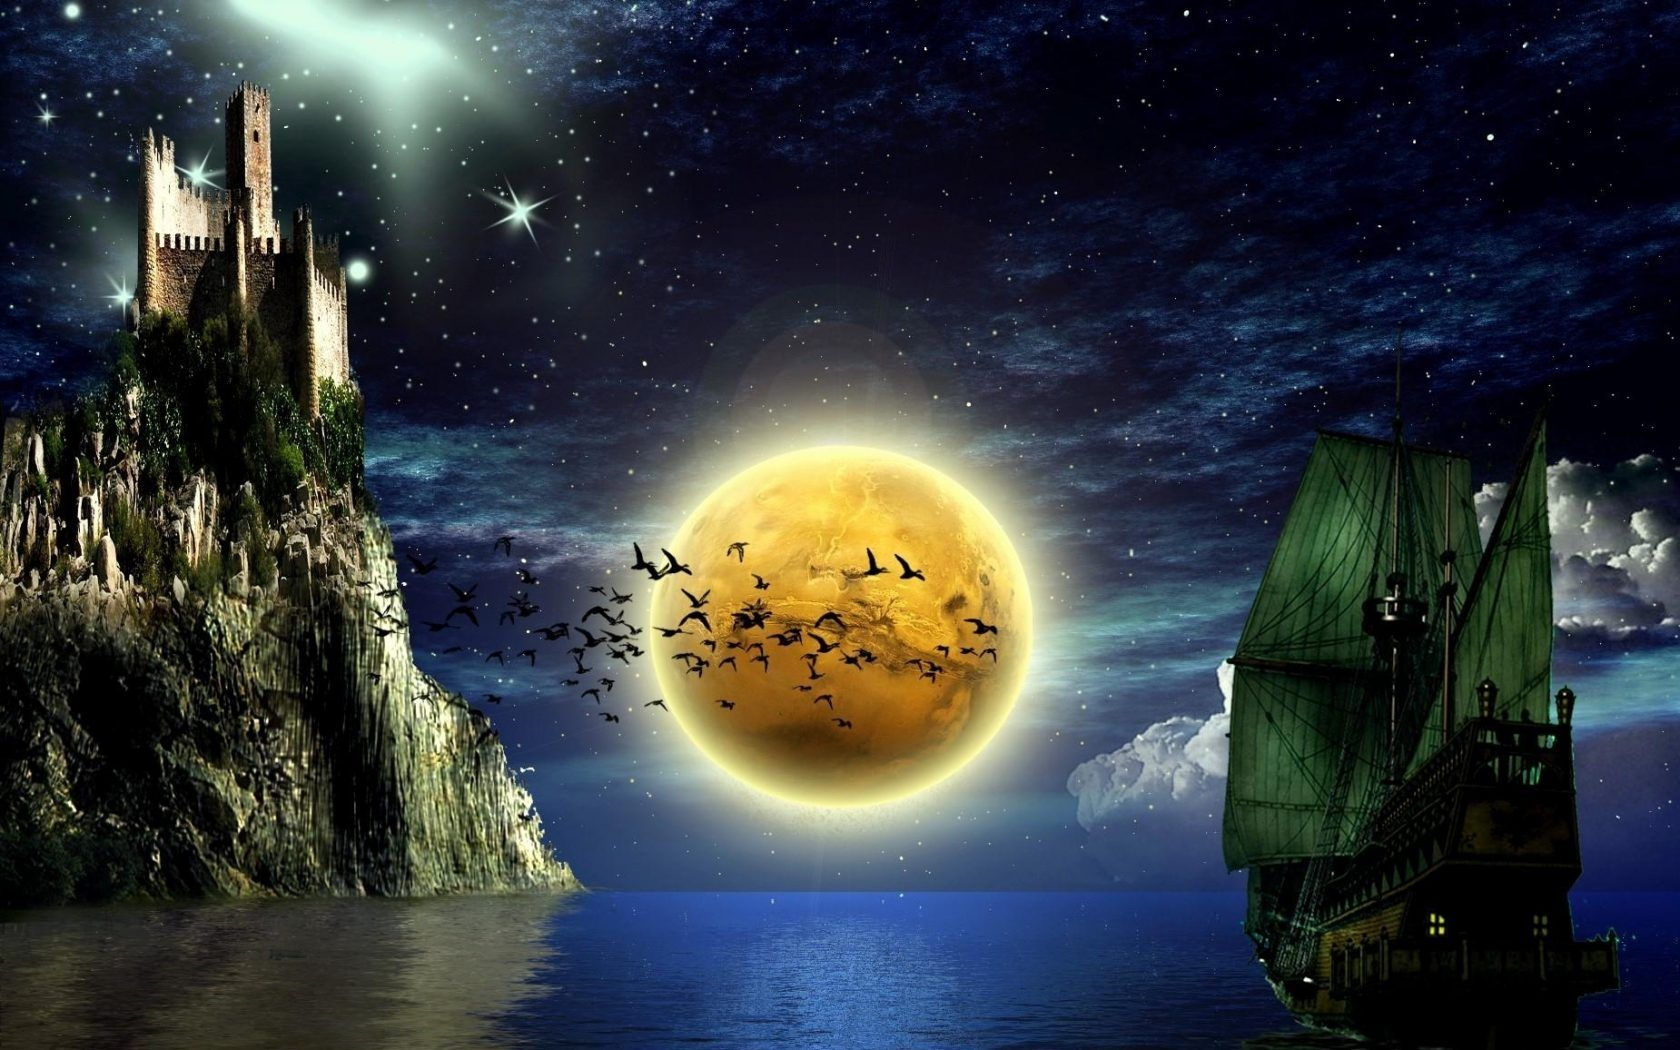 Http Www Fonditos3d Com 1680x1050 Paisaje Nocturno 3d Con Pajaros Jpg Ocean Wallpaper Fantasy Moonscape